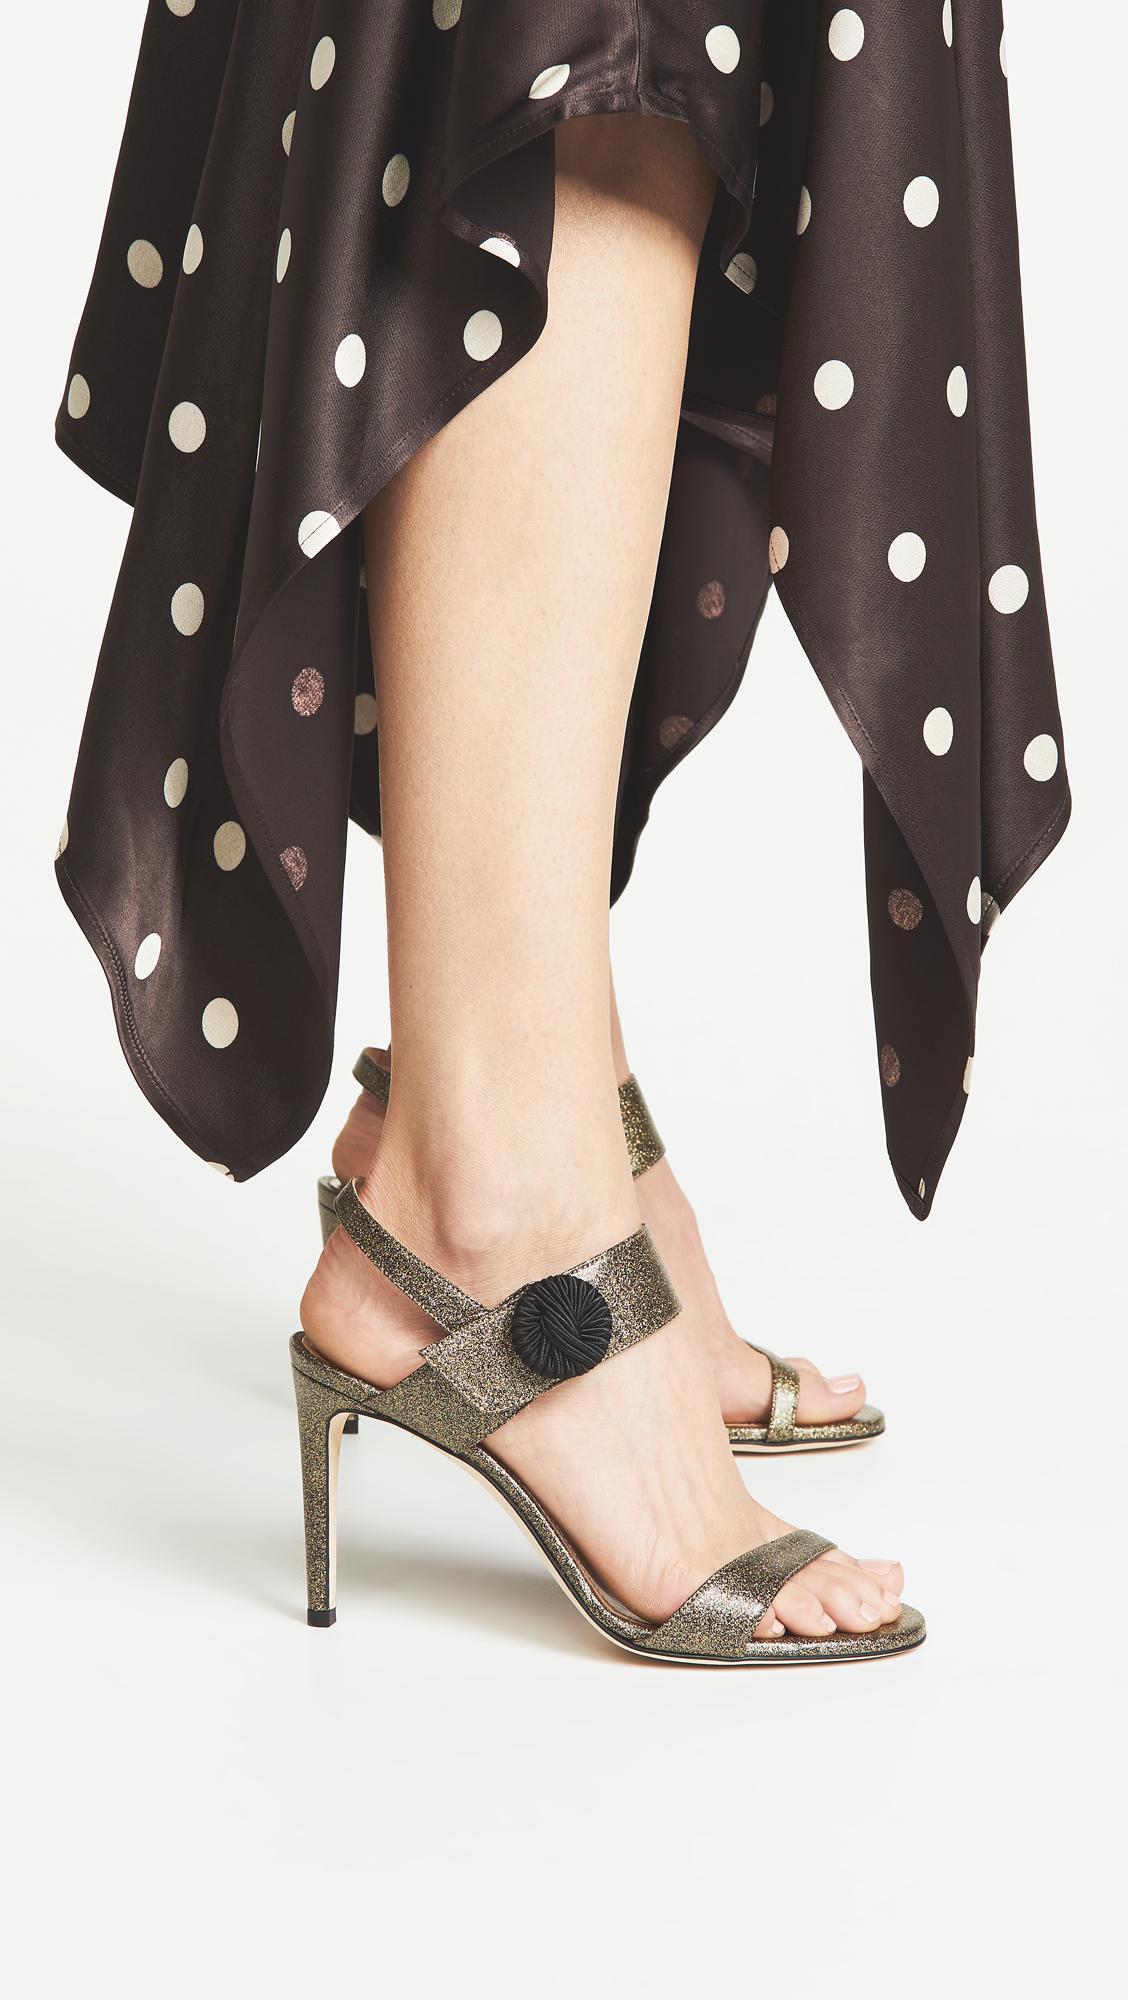 0ba489b5302e05 Chloe Gosselin - Metallic Tori 90 Sandals - Lyst. View fullscreen